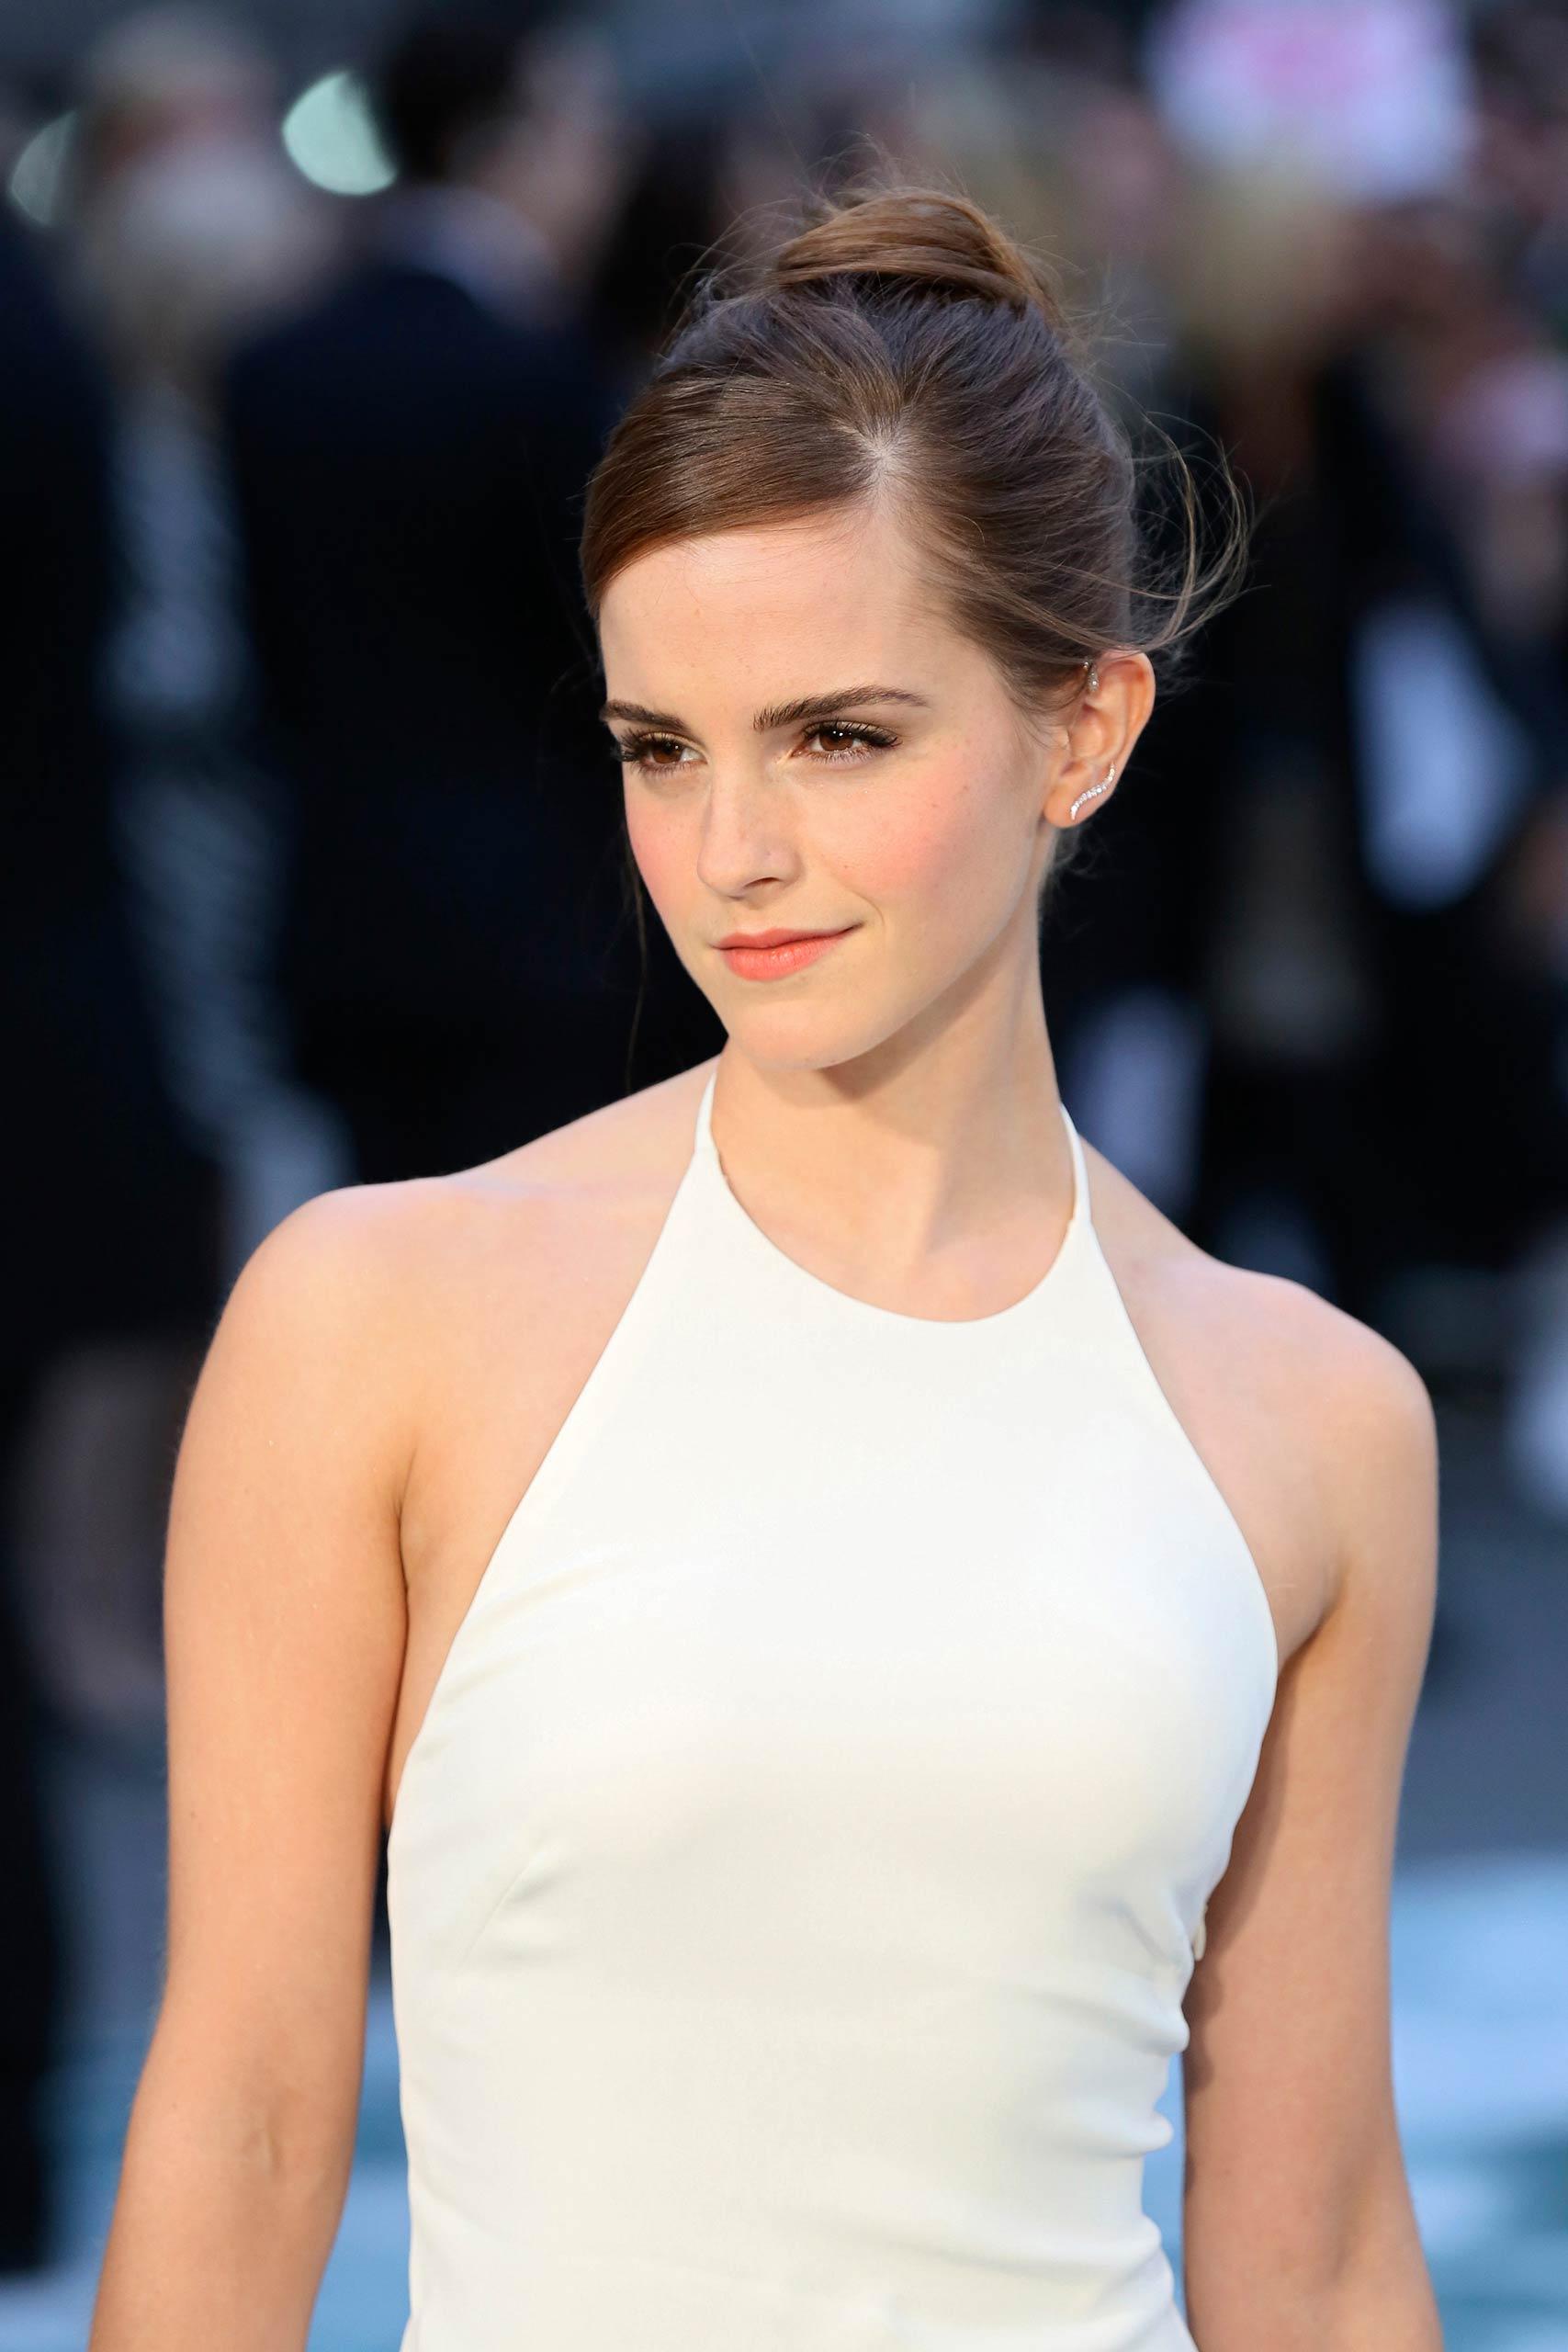 Emma Watson arrives for the UK premiere of <i>Noah</i> in London in 2014.